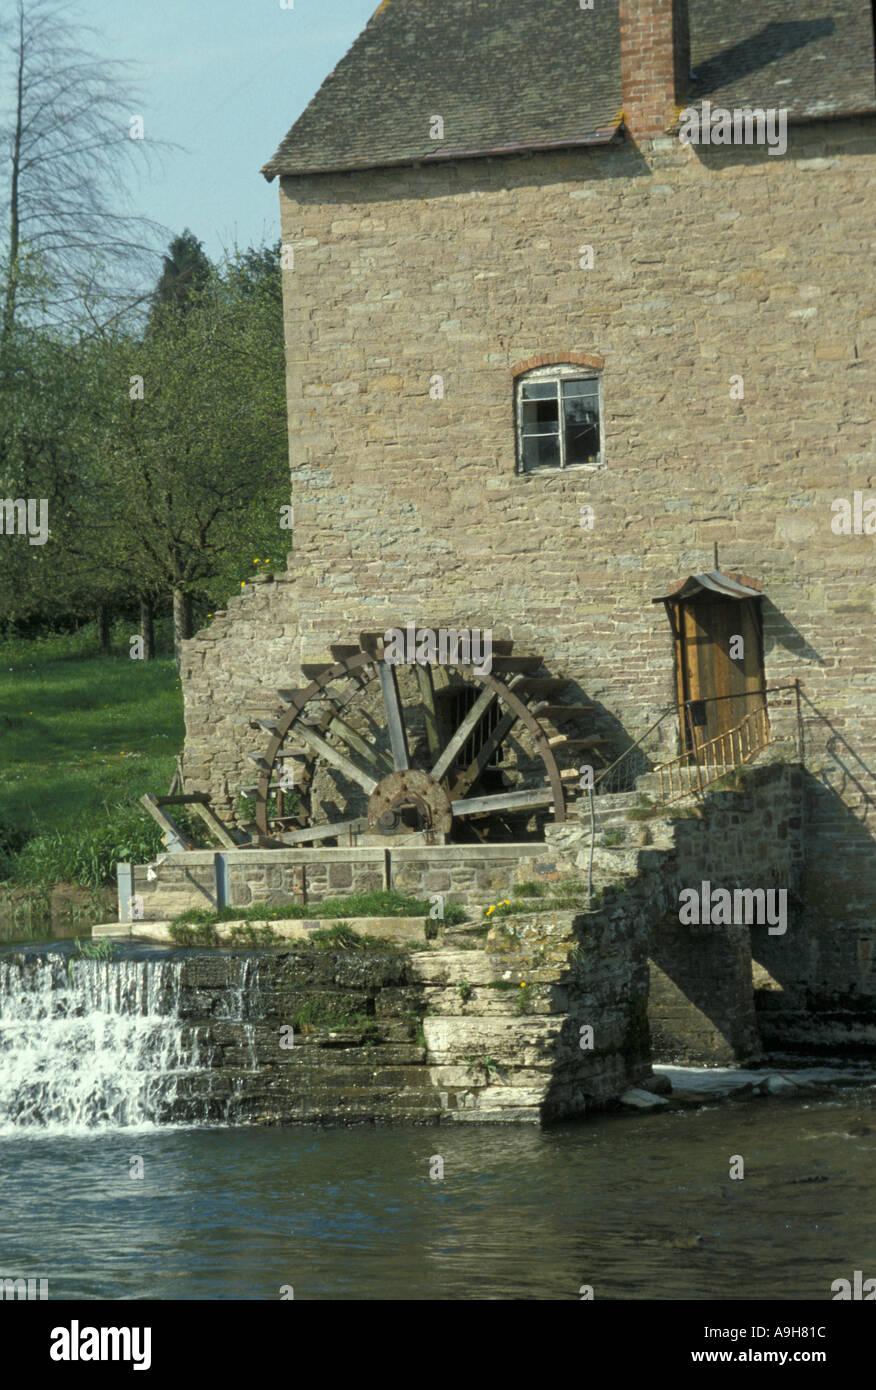 Power Water Derelict water wheel besides a Shropshire stream - Stock Image